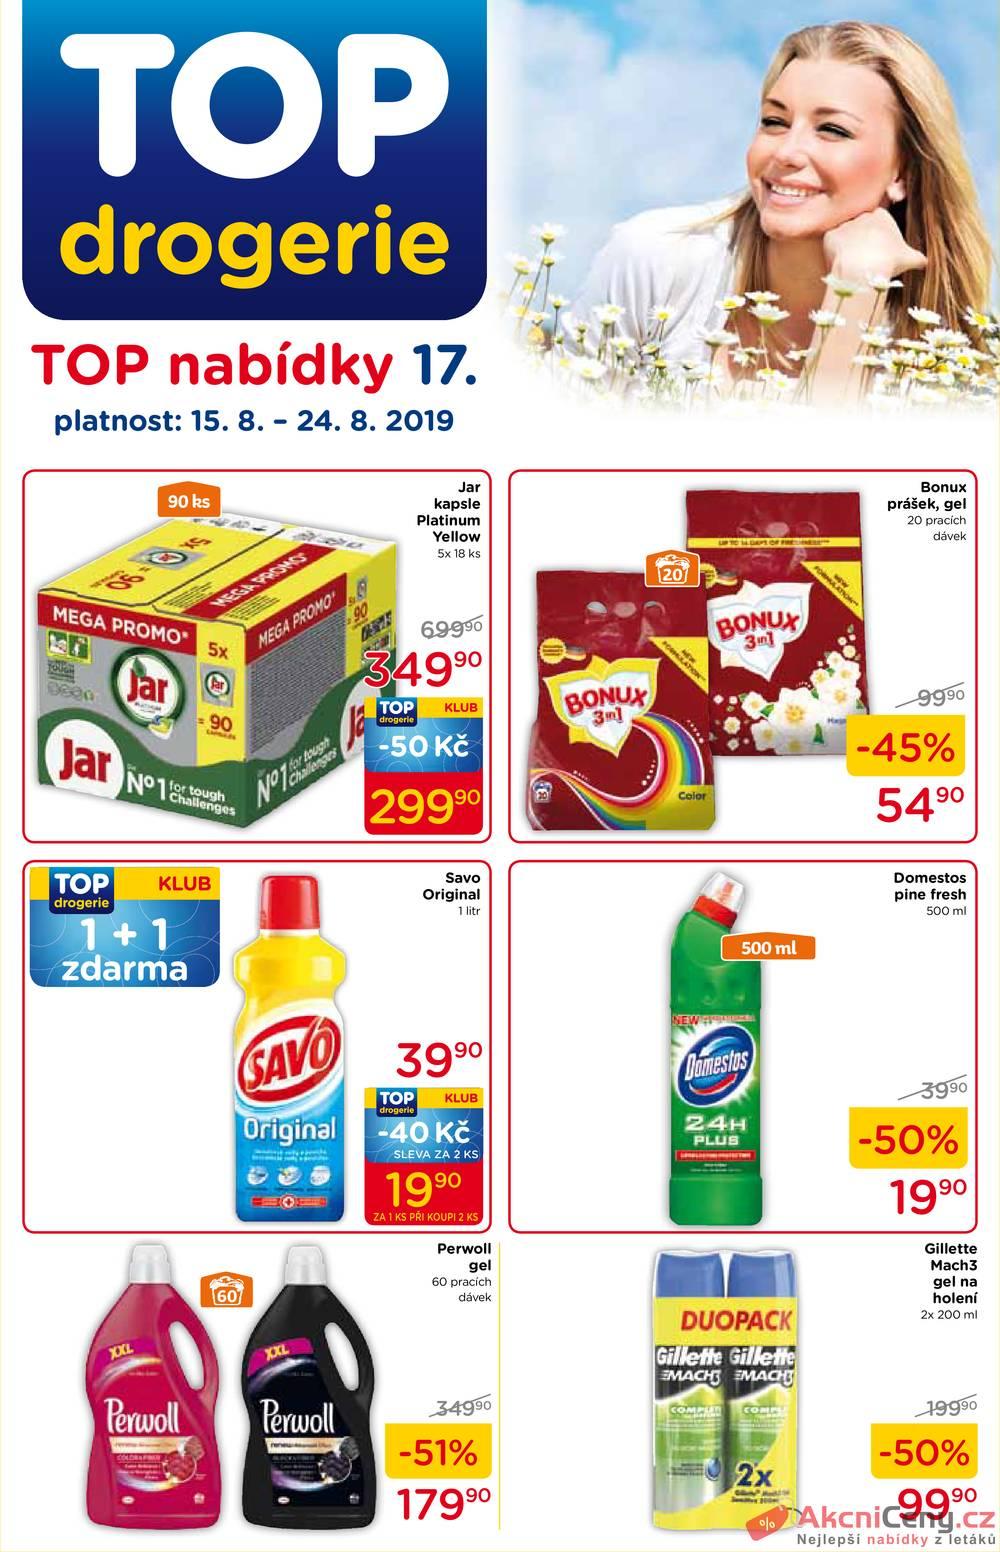 Leták TOP drogerie - TOP drogerie  od 15.8. do 24.8.2019 - strana 1